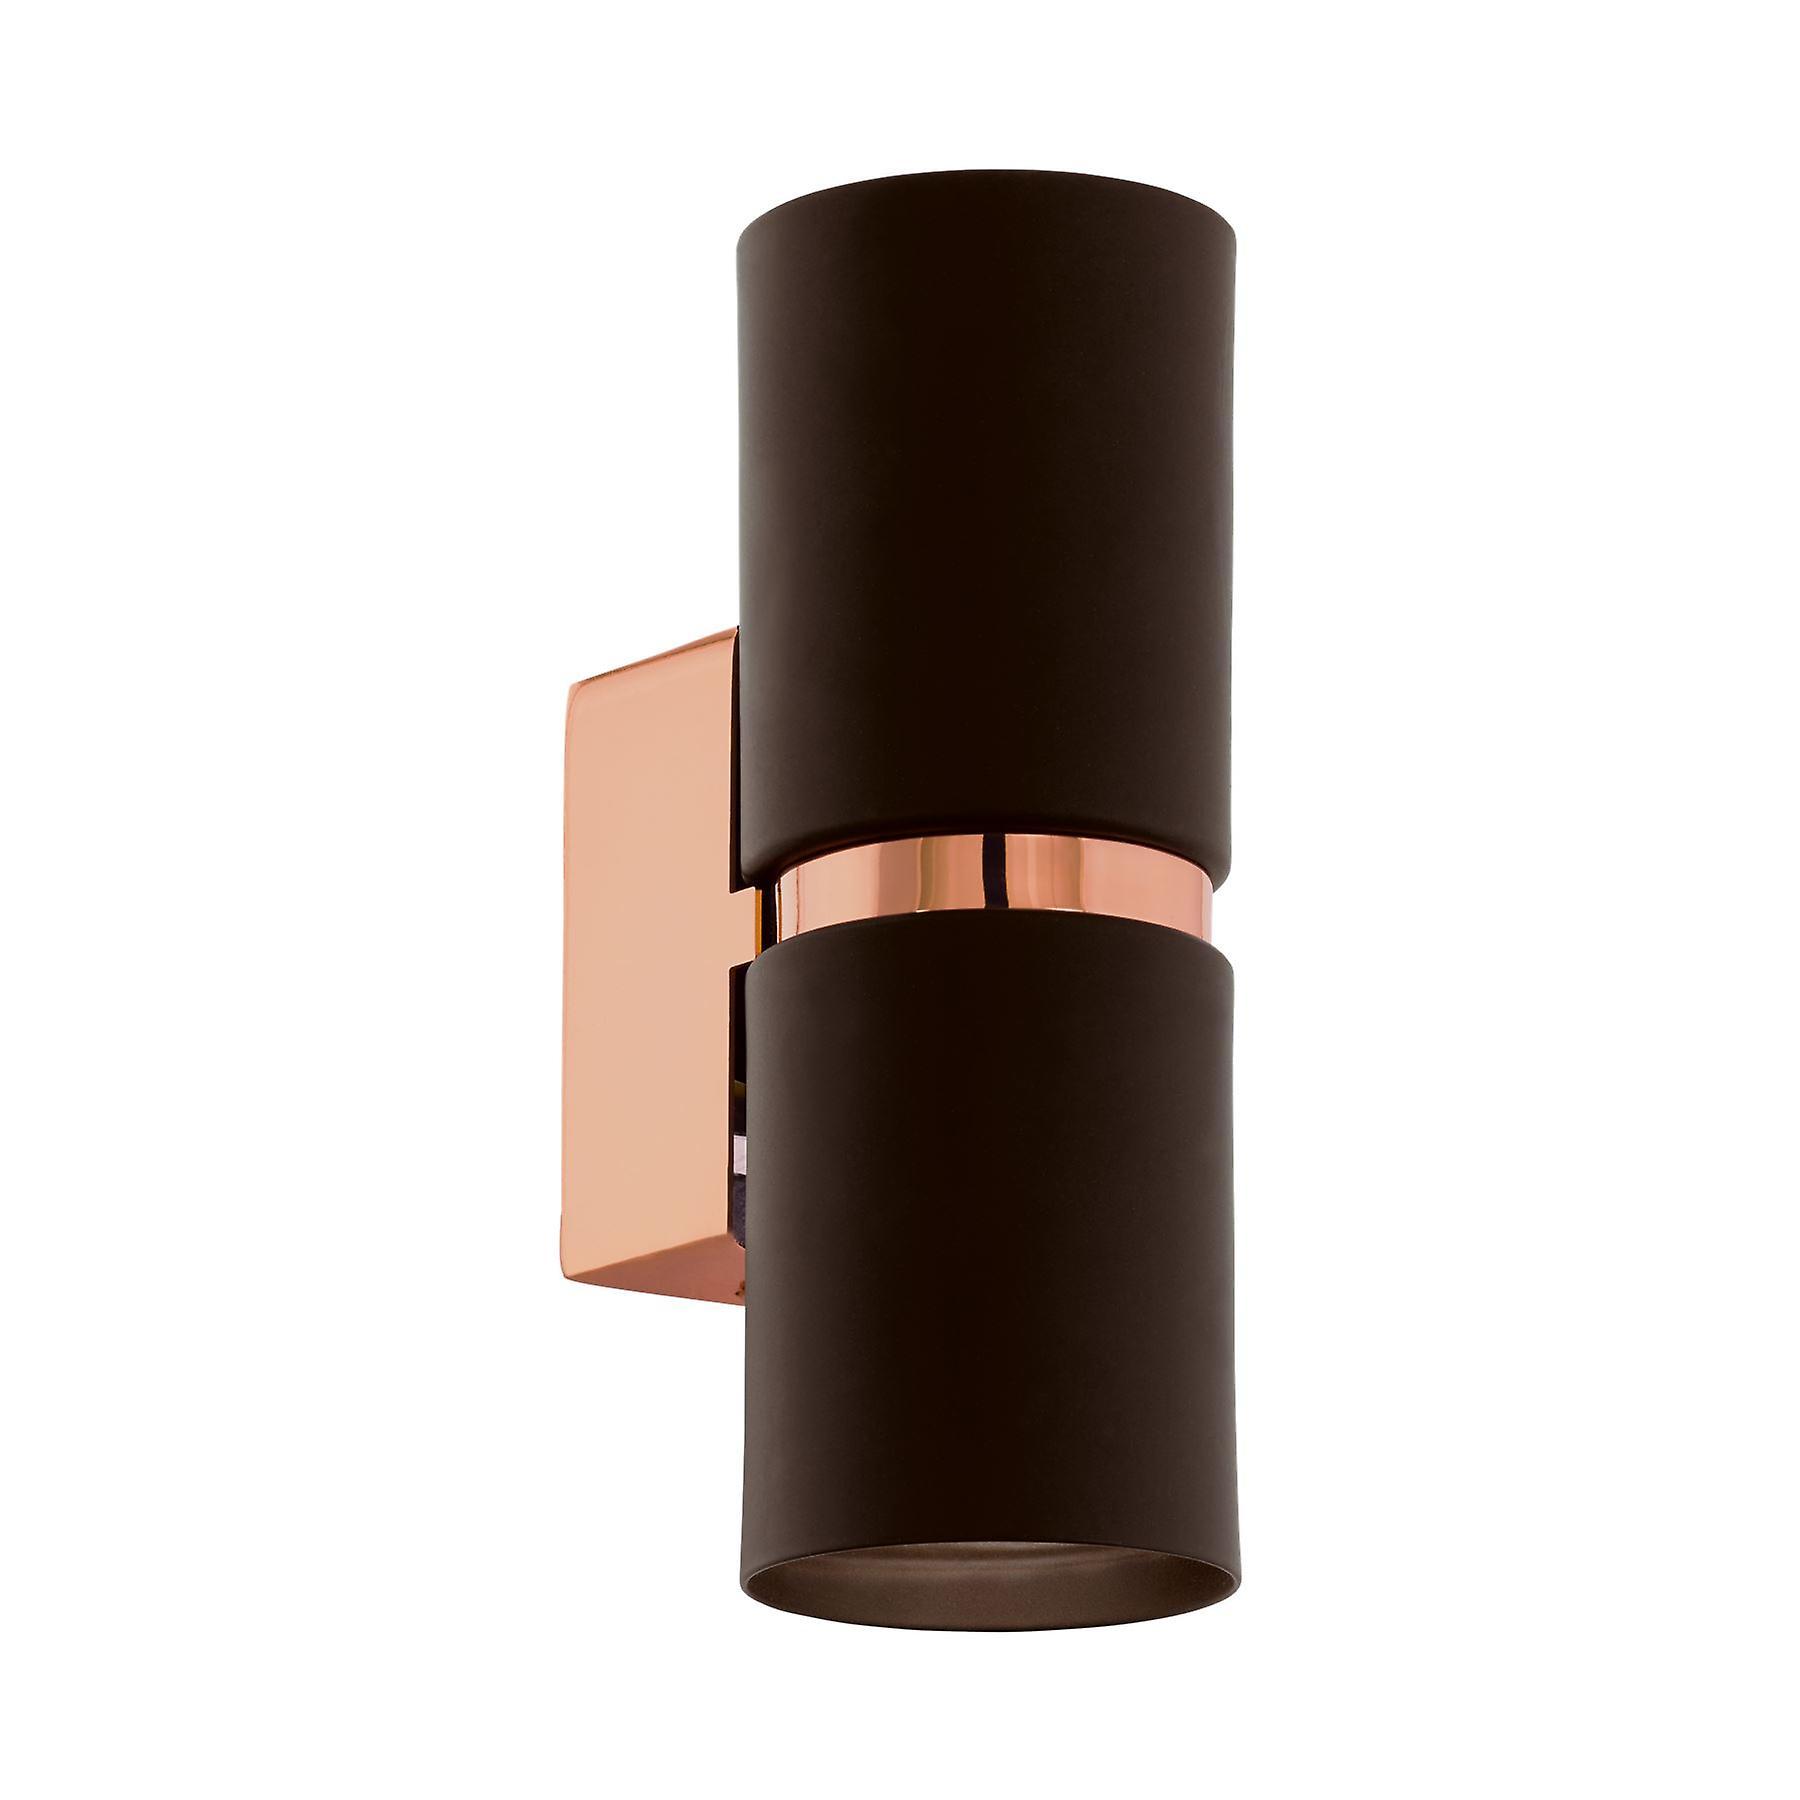 Eglo - Passa Tubular LED Wall Up Down Spot lumière marron & Copper EG95371